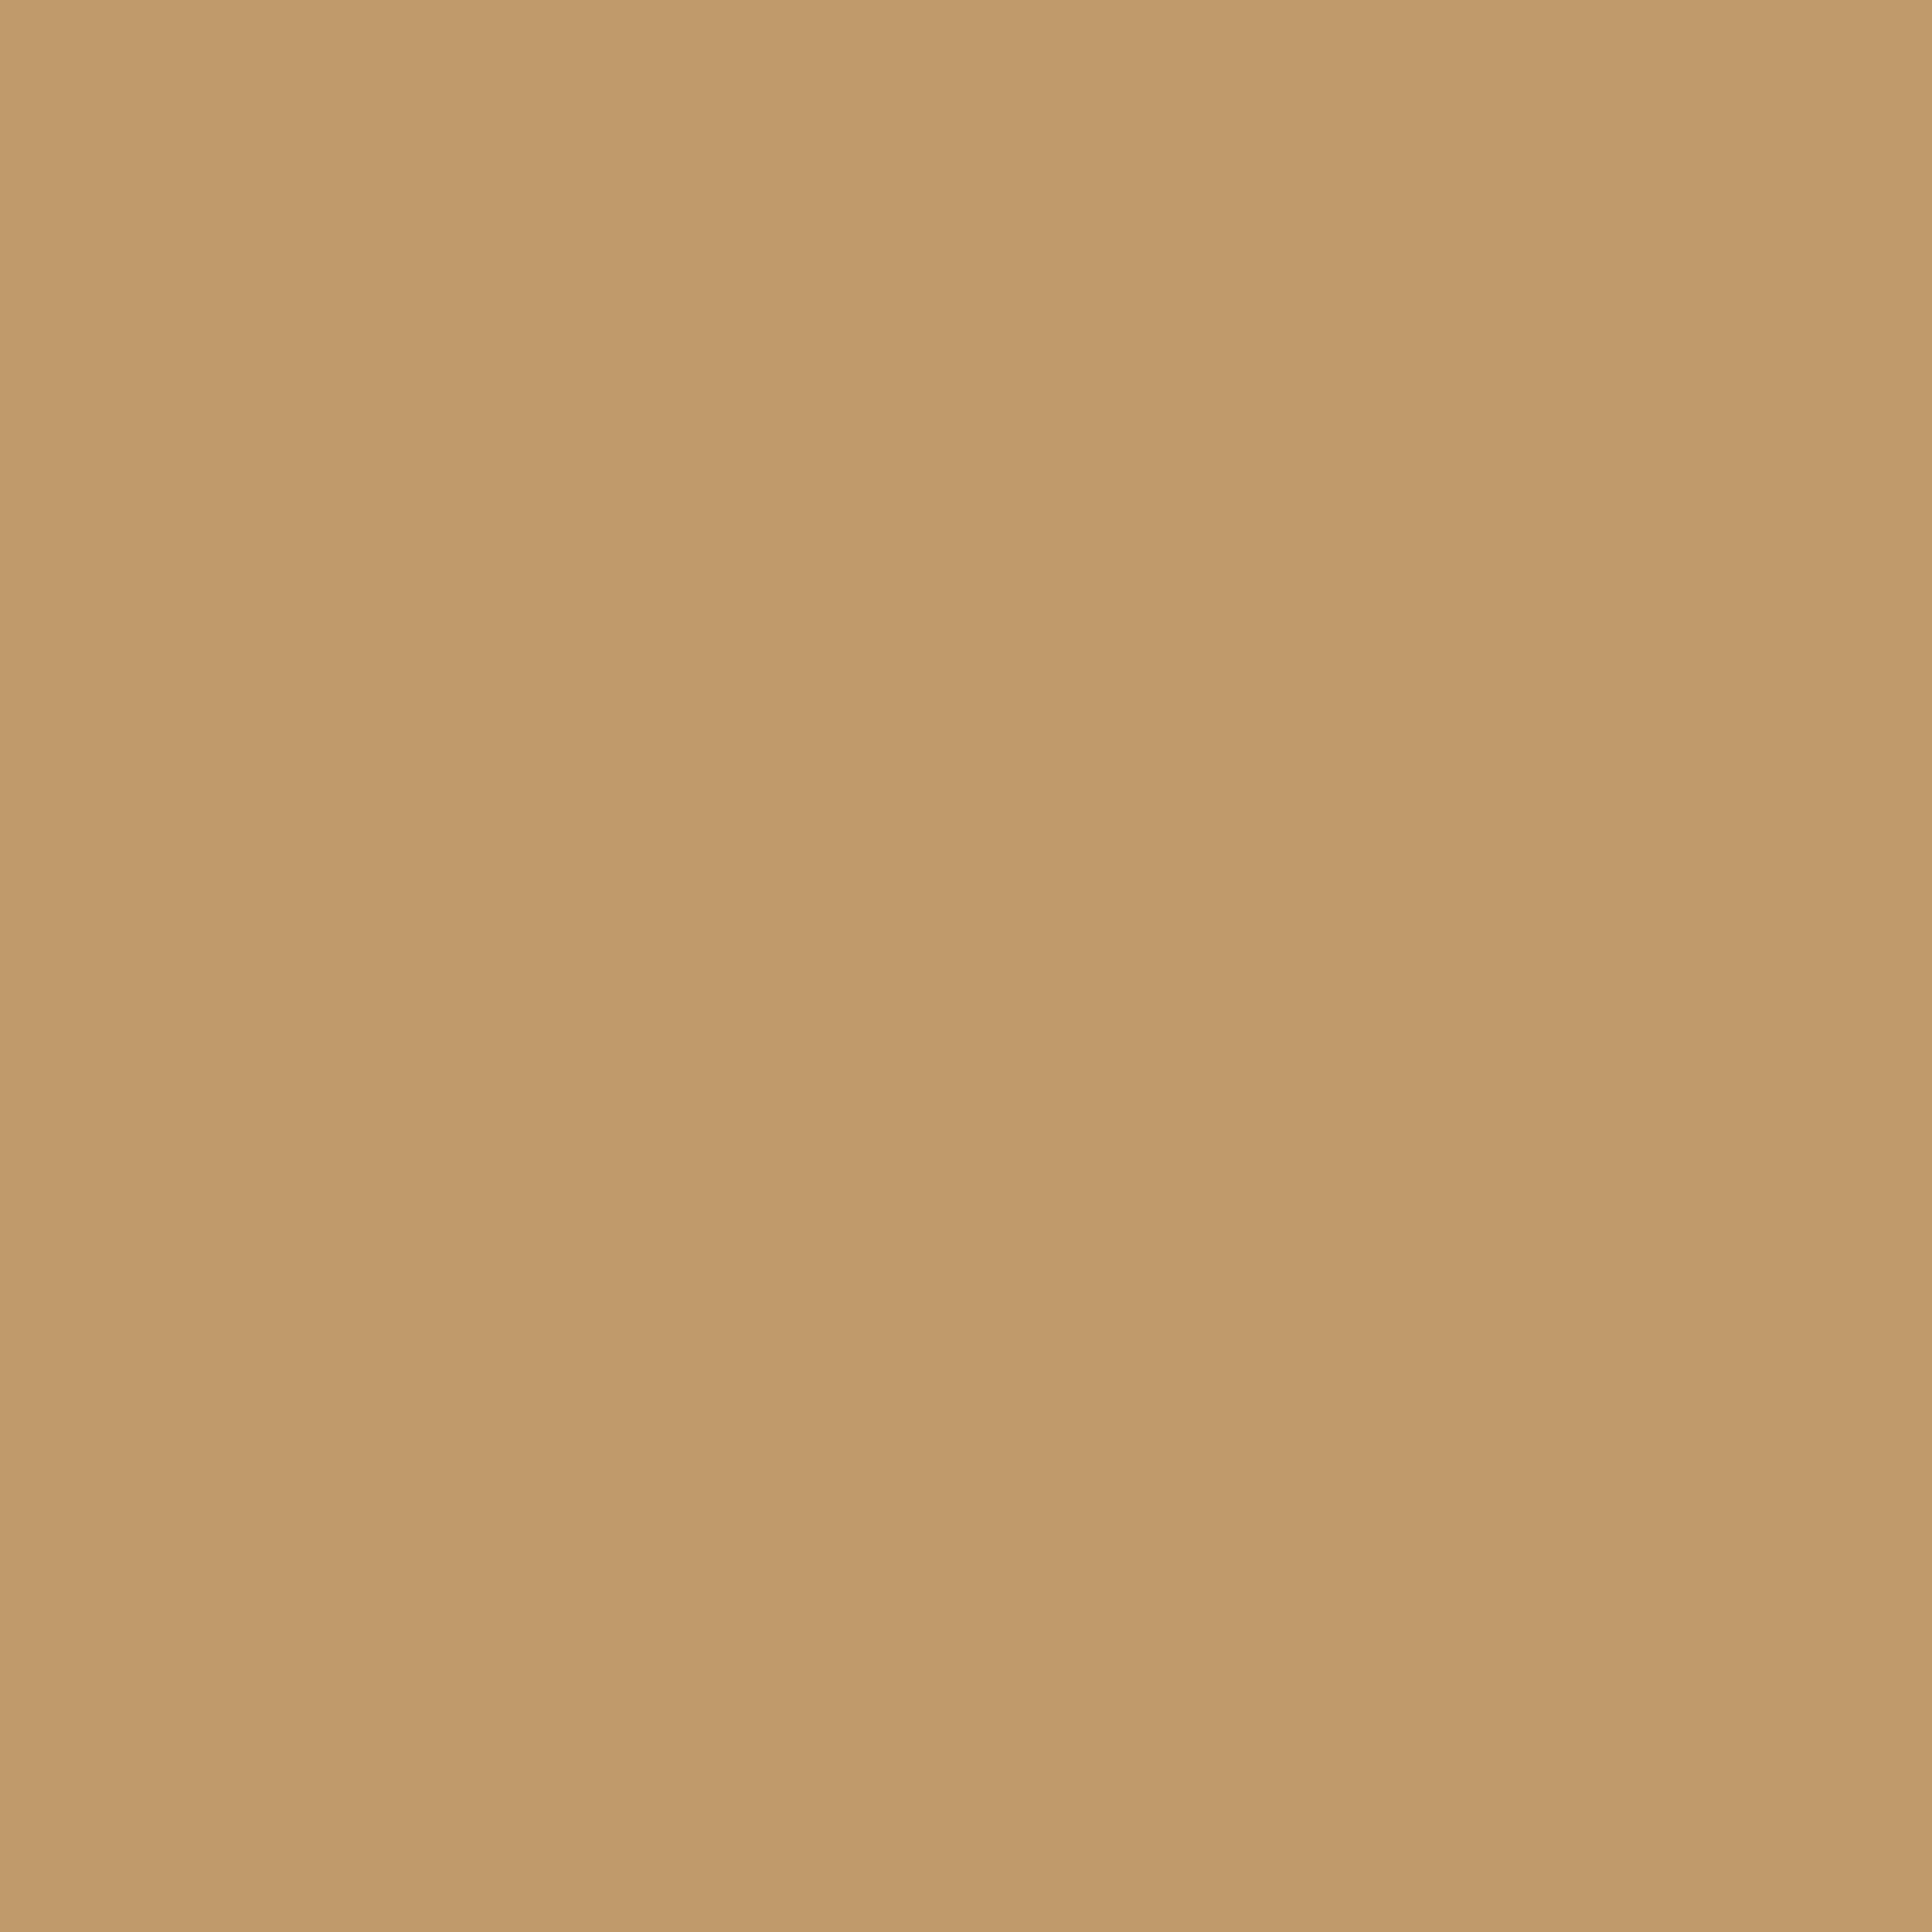 2048x2048 Camel Solid Color Background